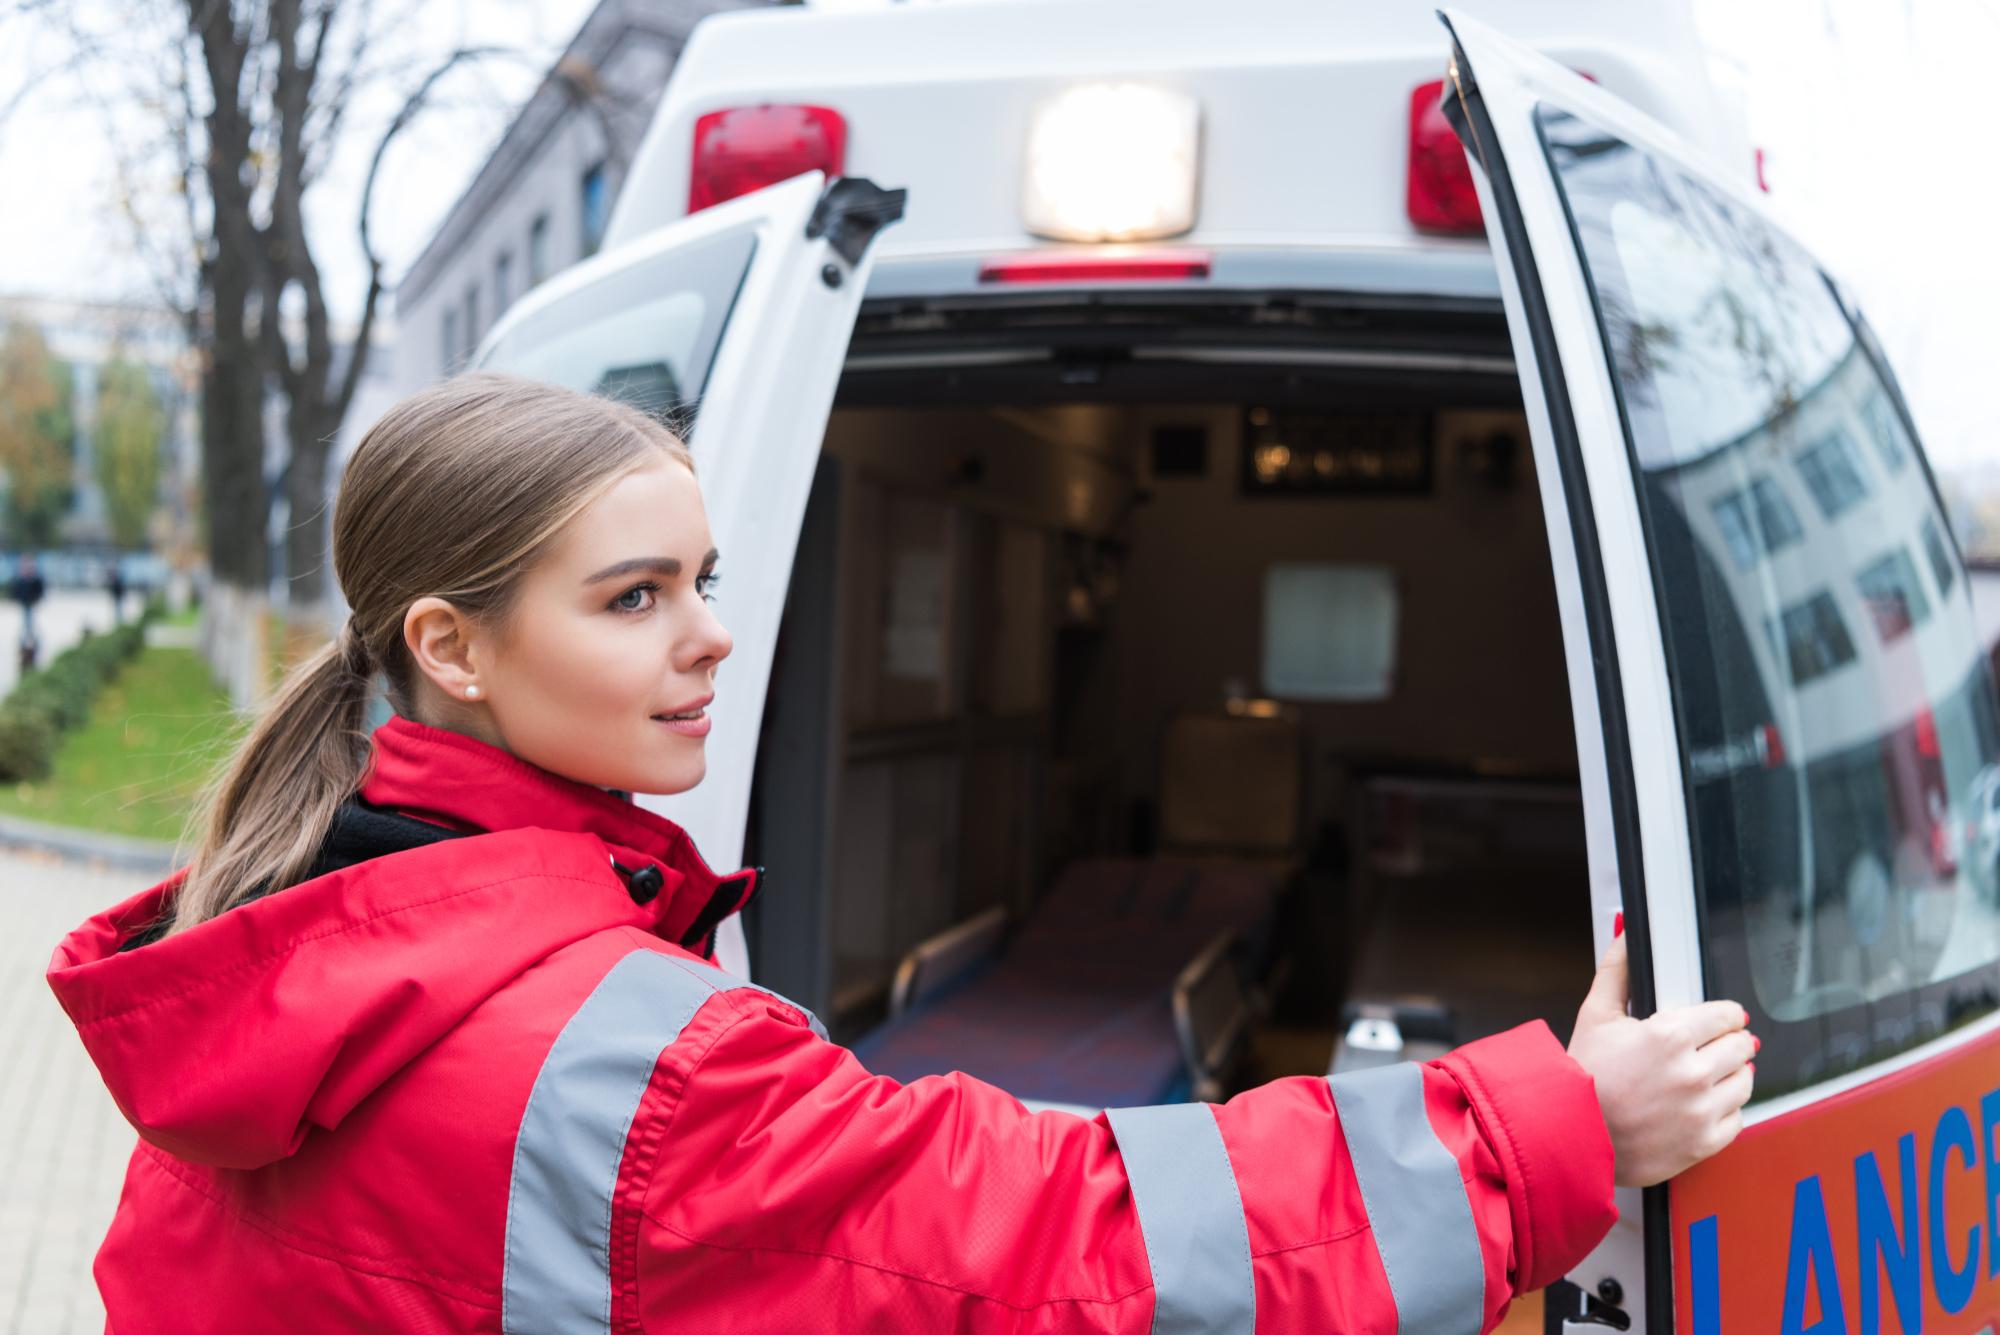 emt paramedic by ambulance